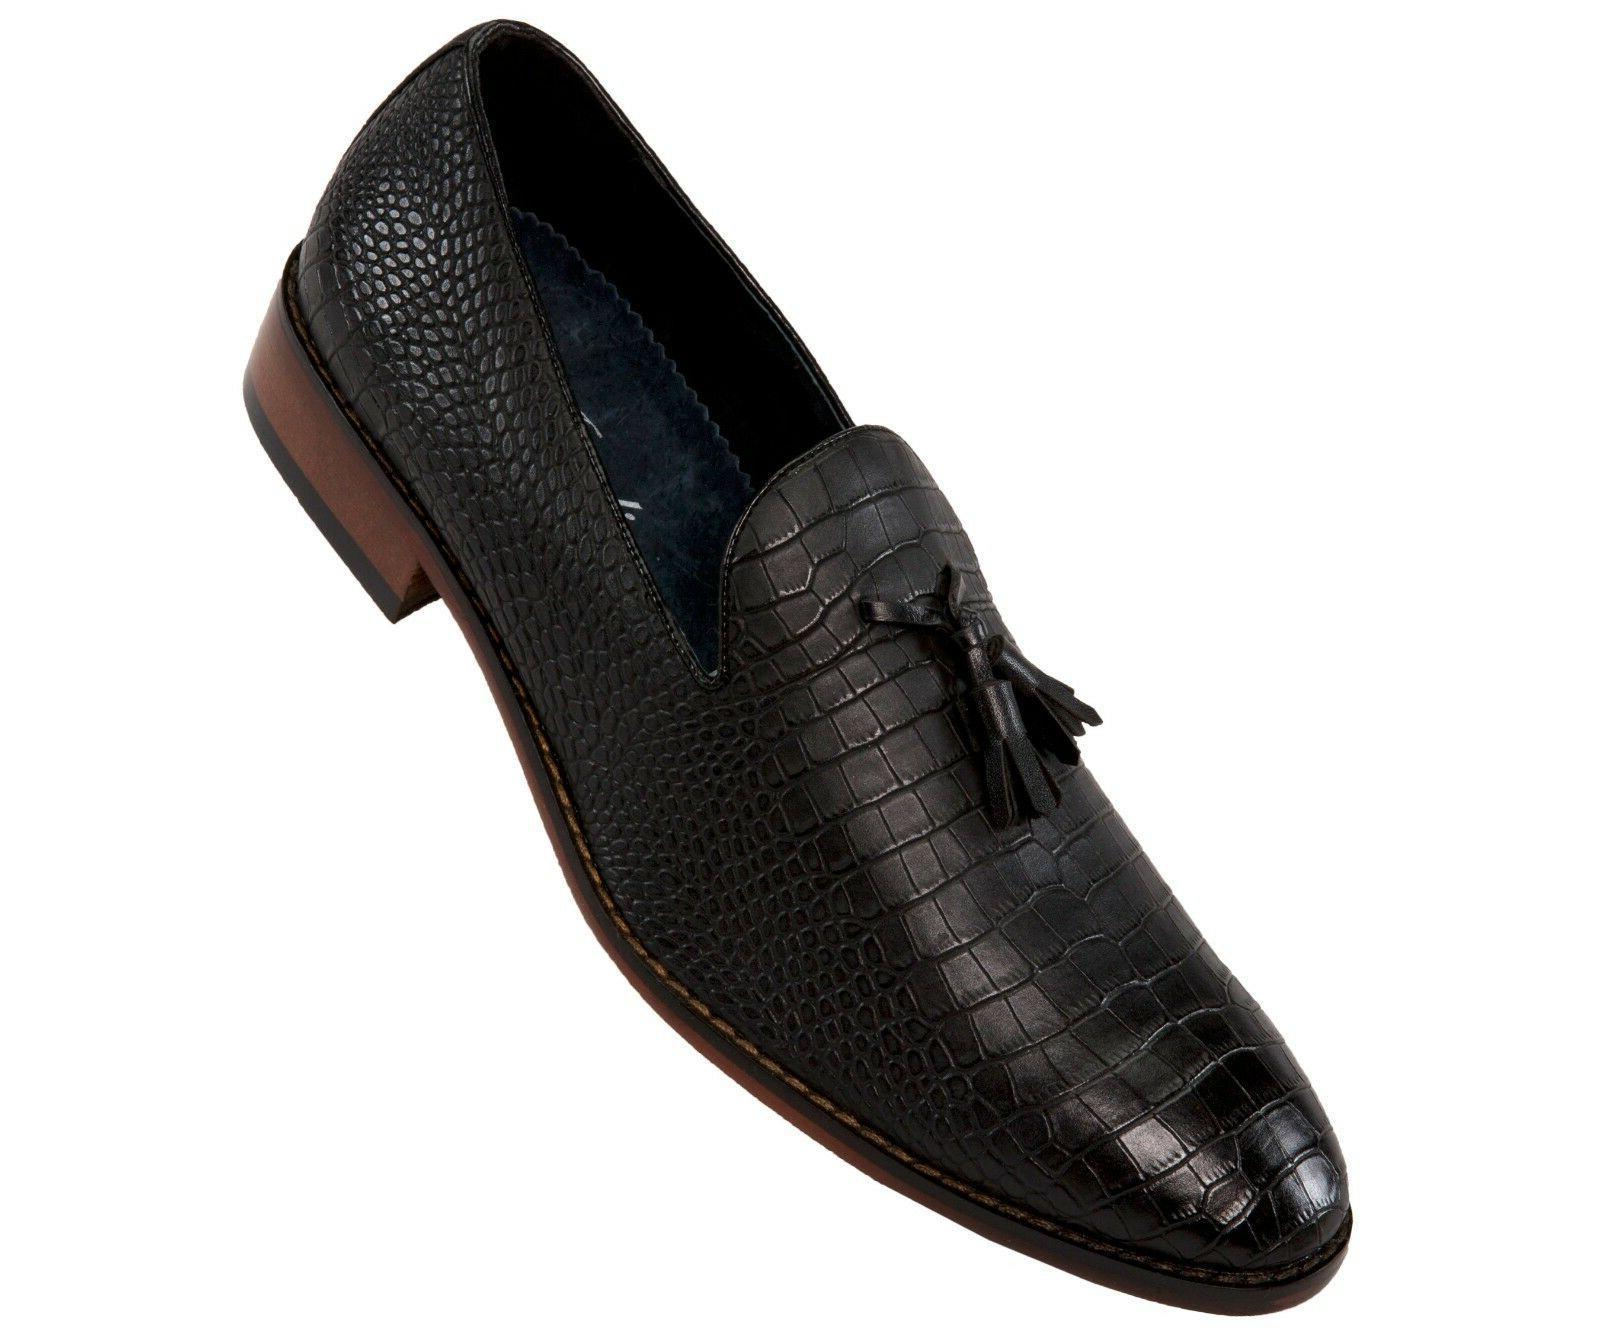 Amali Mens Two-Tone Cheetah Print Patent Slip On Dress Shoes